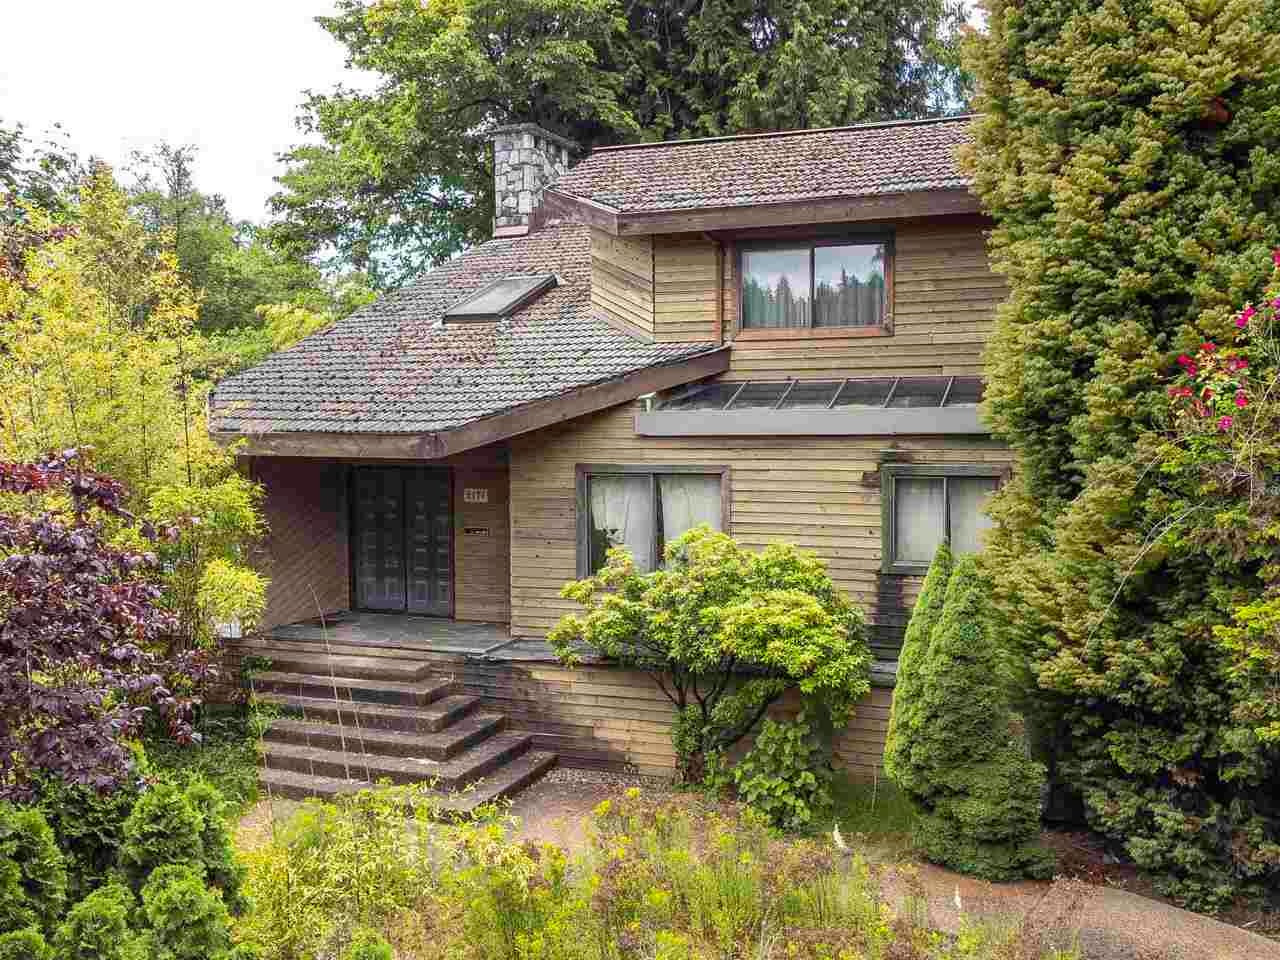 6171 BLENHEIM STREET - Southlands House/Single Family for sale, 6 Bedrooms (R2592578)